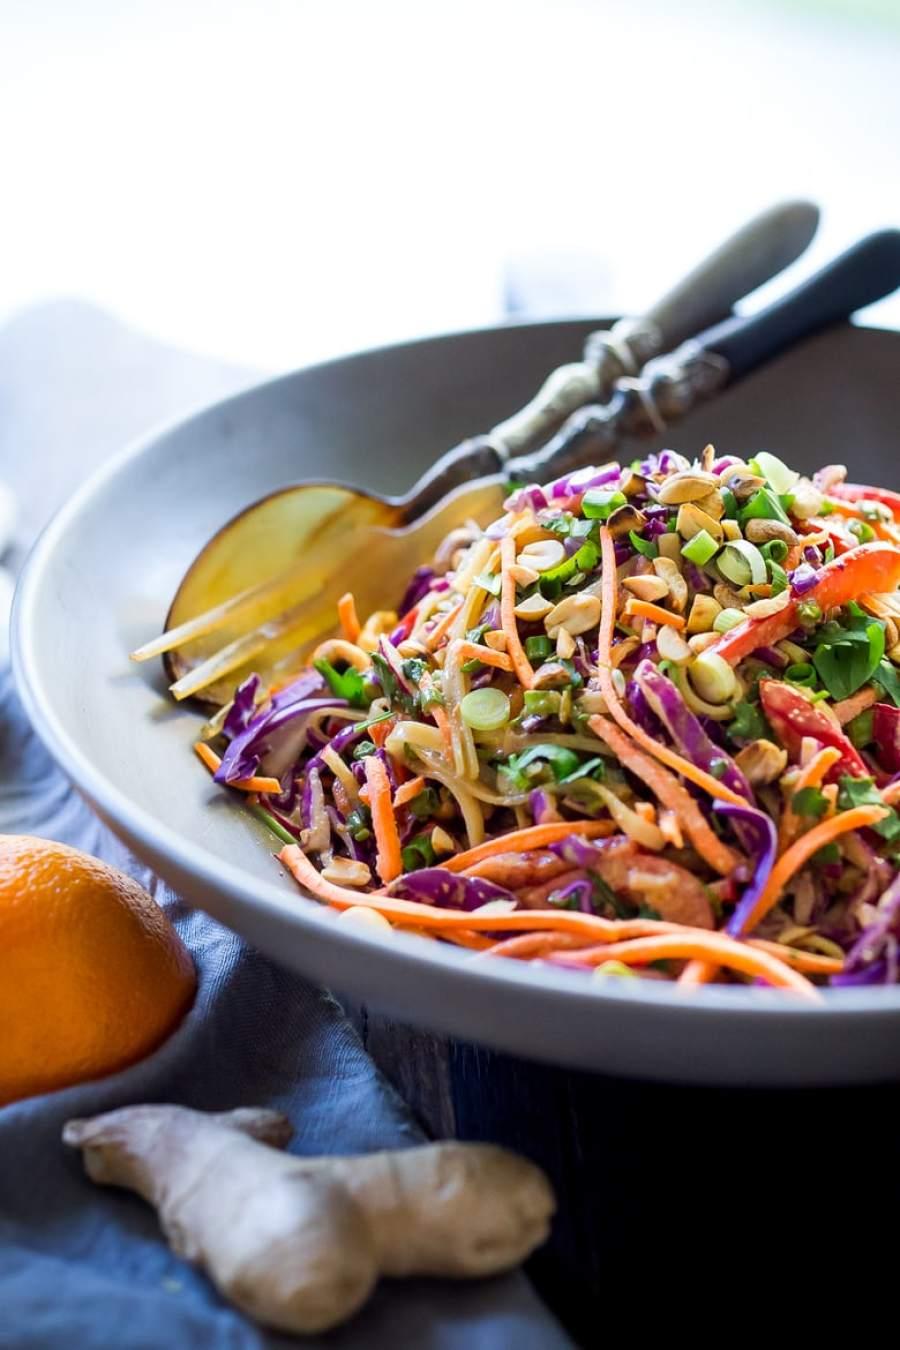 Thai Noodle Salad with Peanut Sauce- loaded up with healthy veggies and the BEST peanut sauce eeeeeeeeeever! Vegan & Gluten-Free | www.feastingathome.com